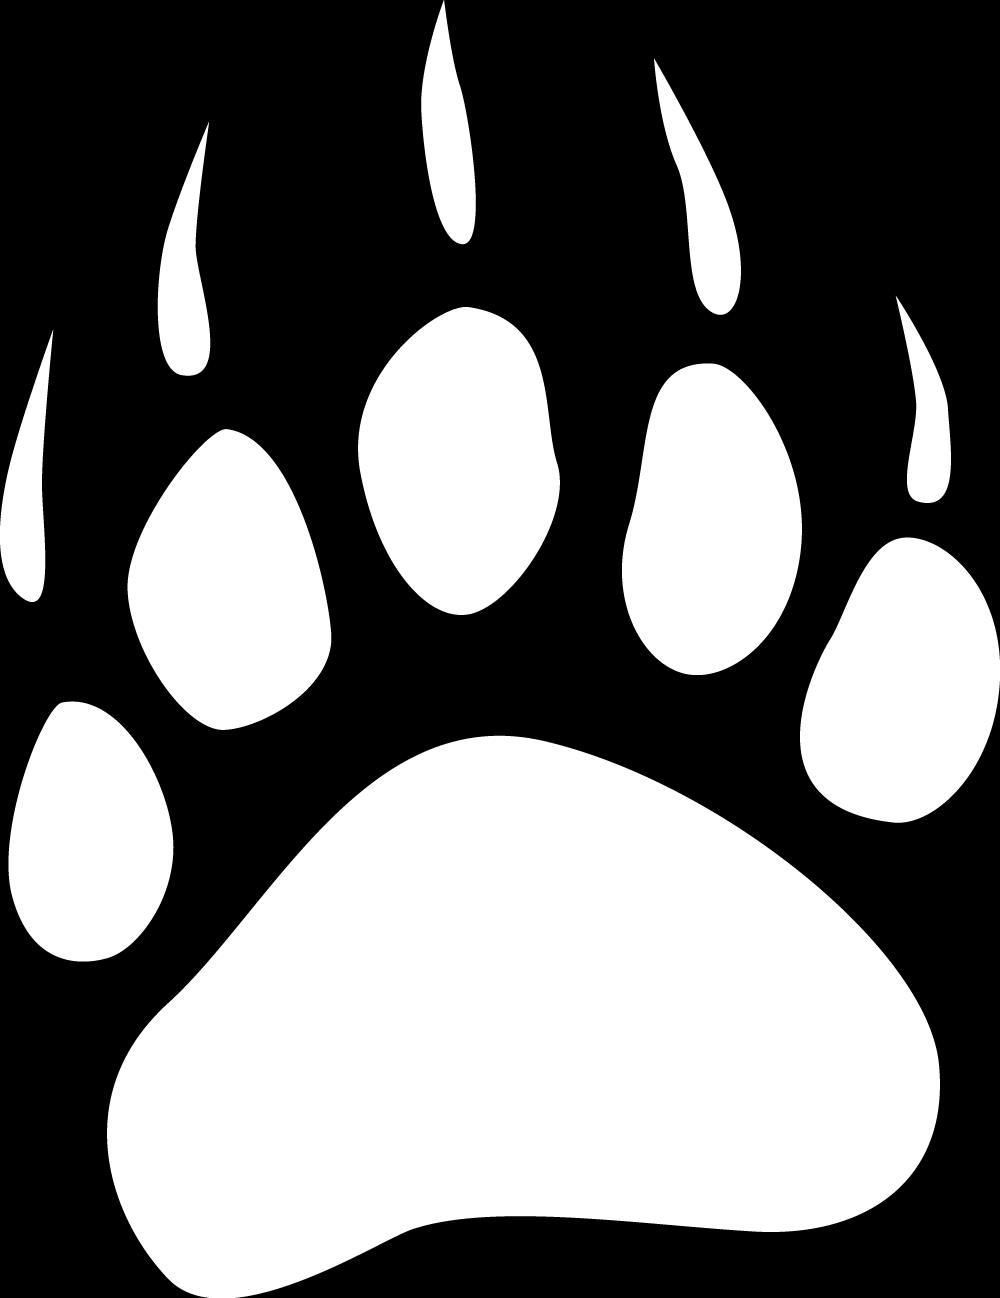 Bear paw print clipart